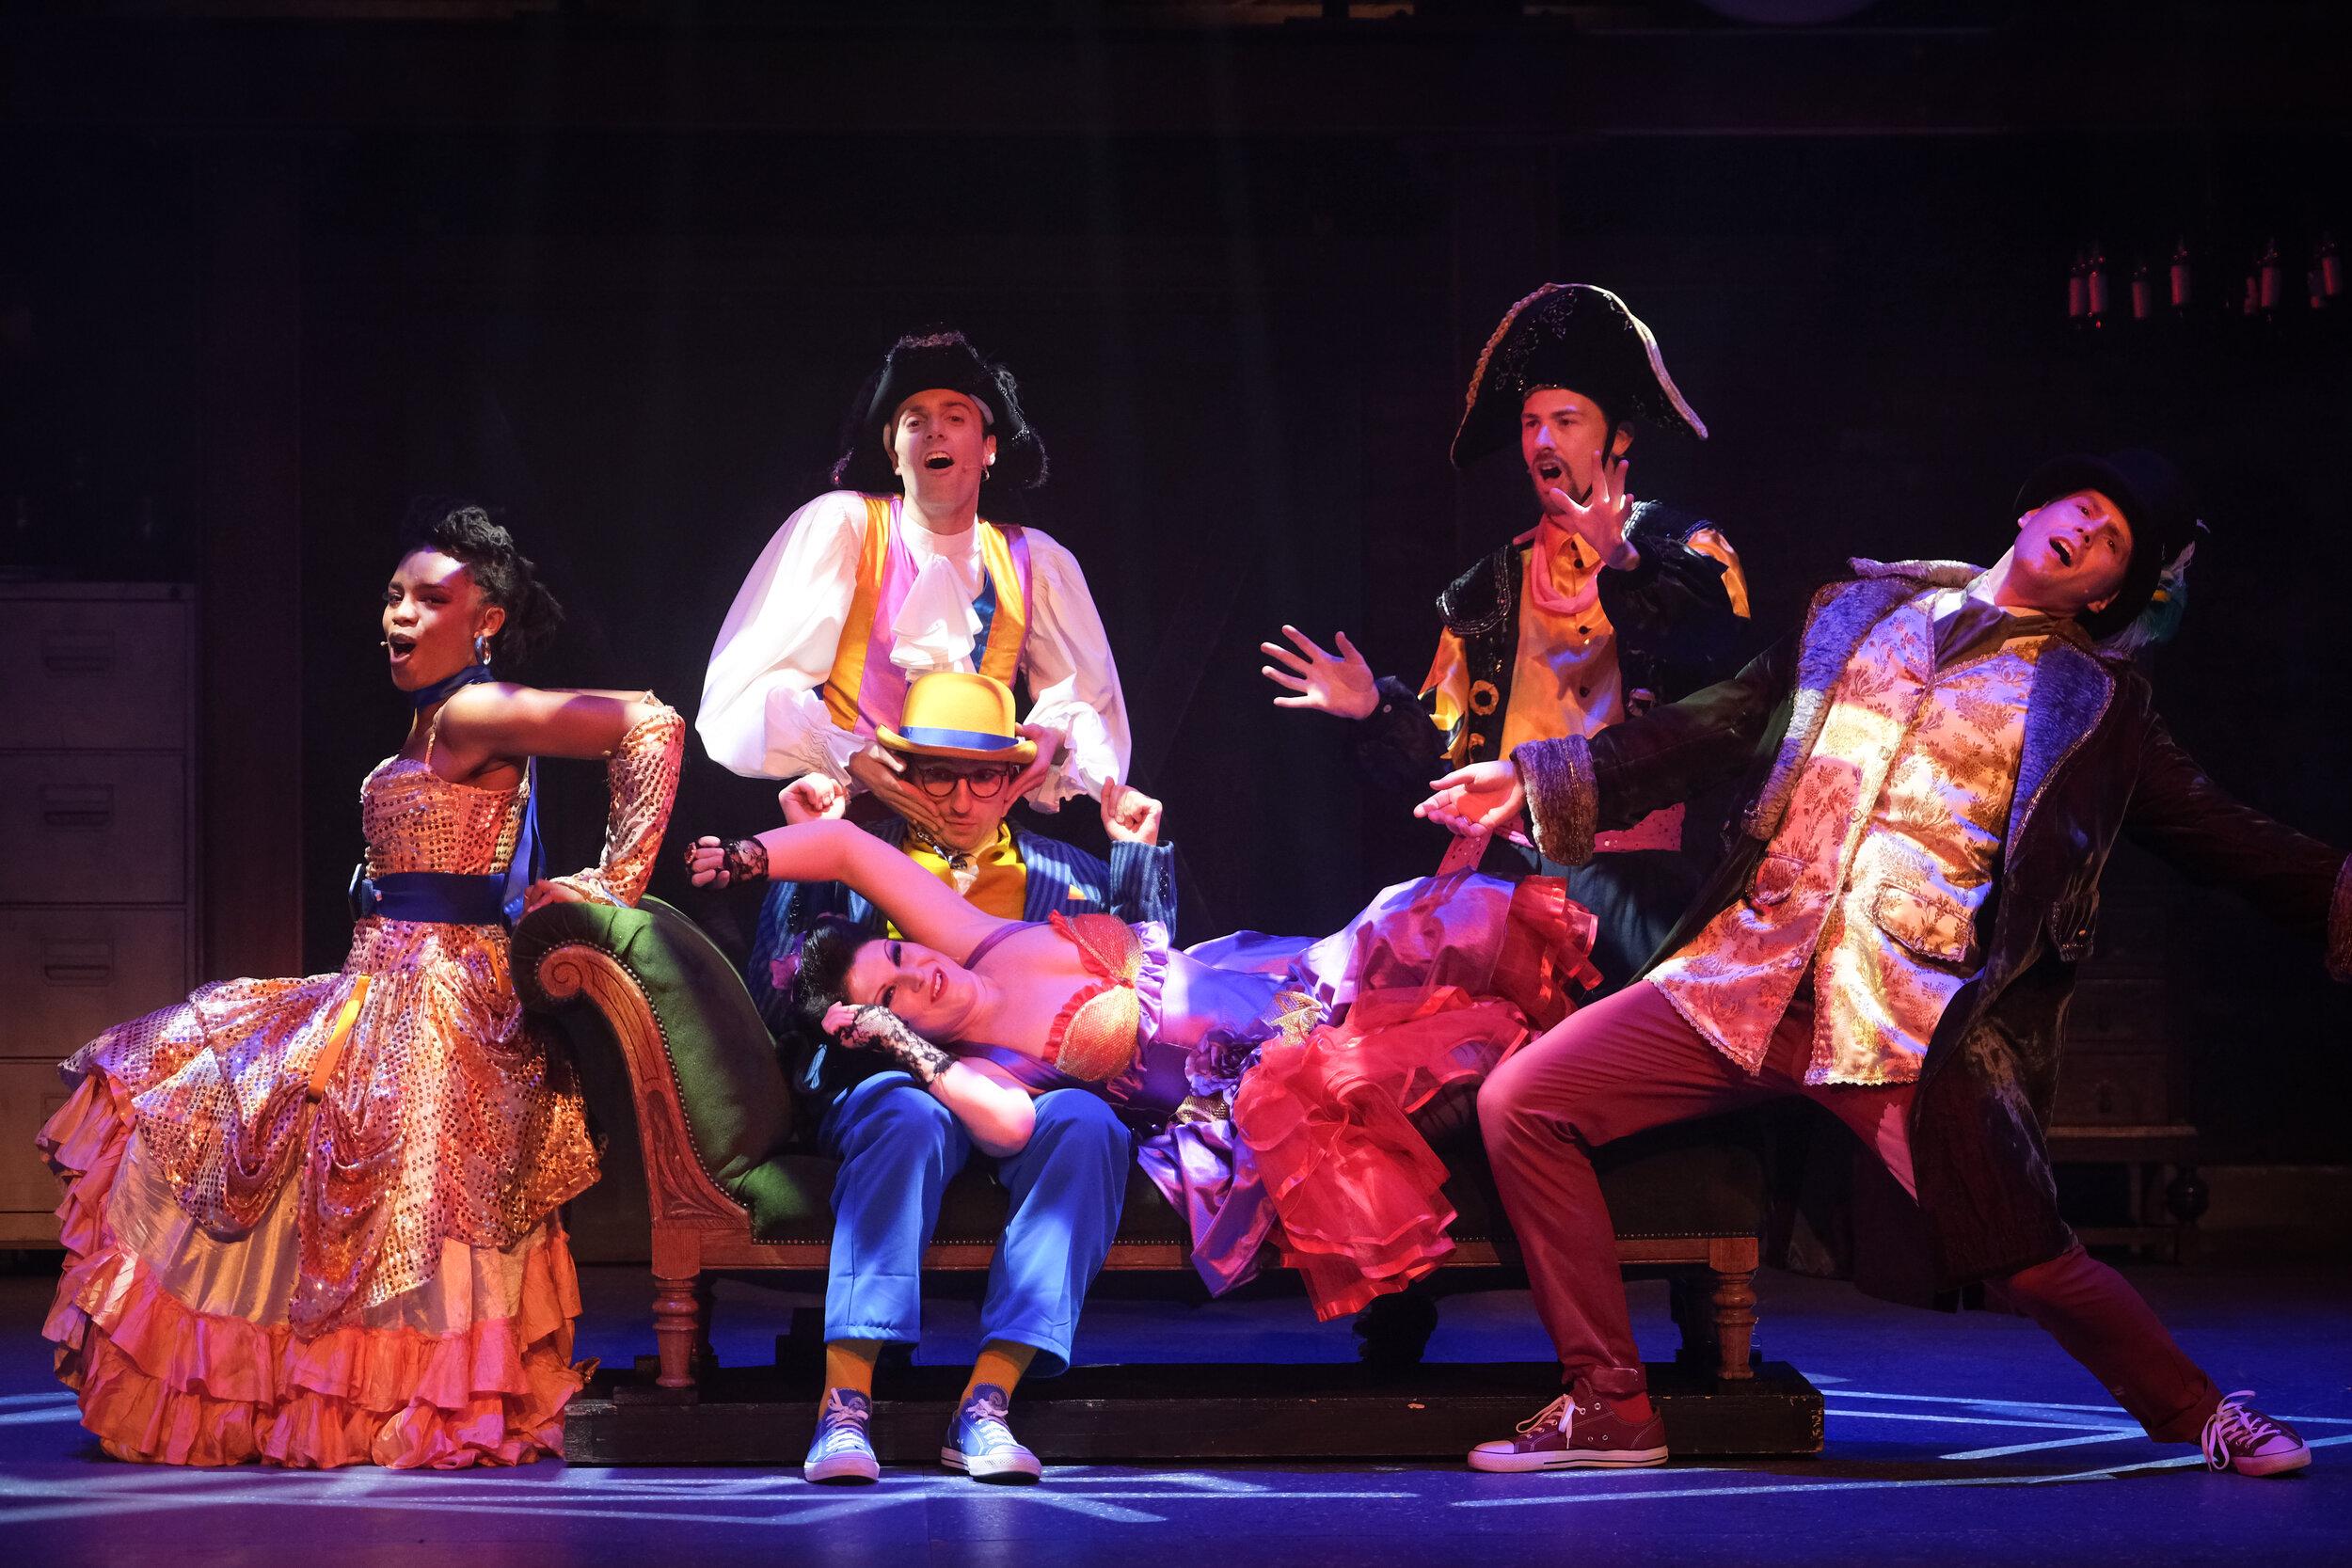 © Around The World in 80s Days | Credit: Blackpool Grand Theatre | Photographer Martin Bostock